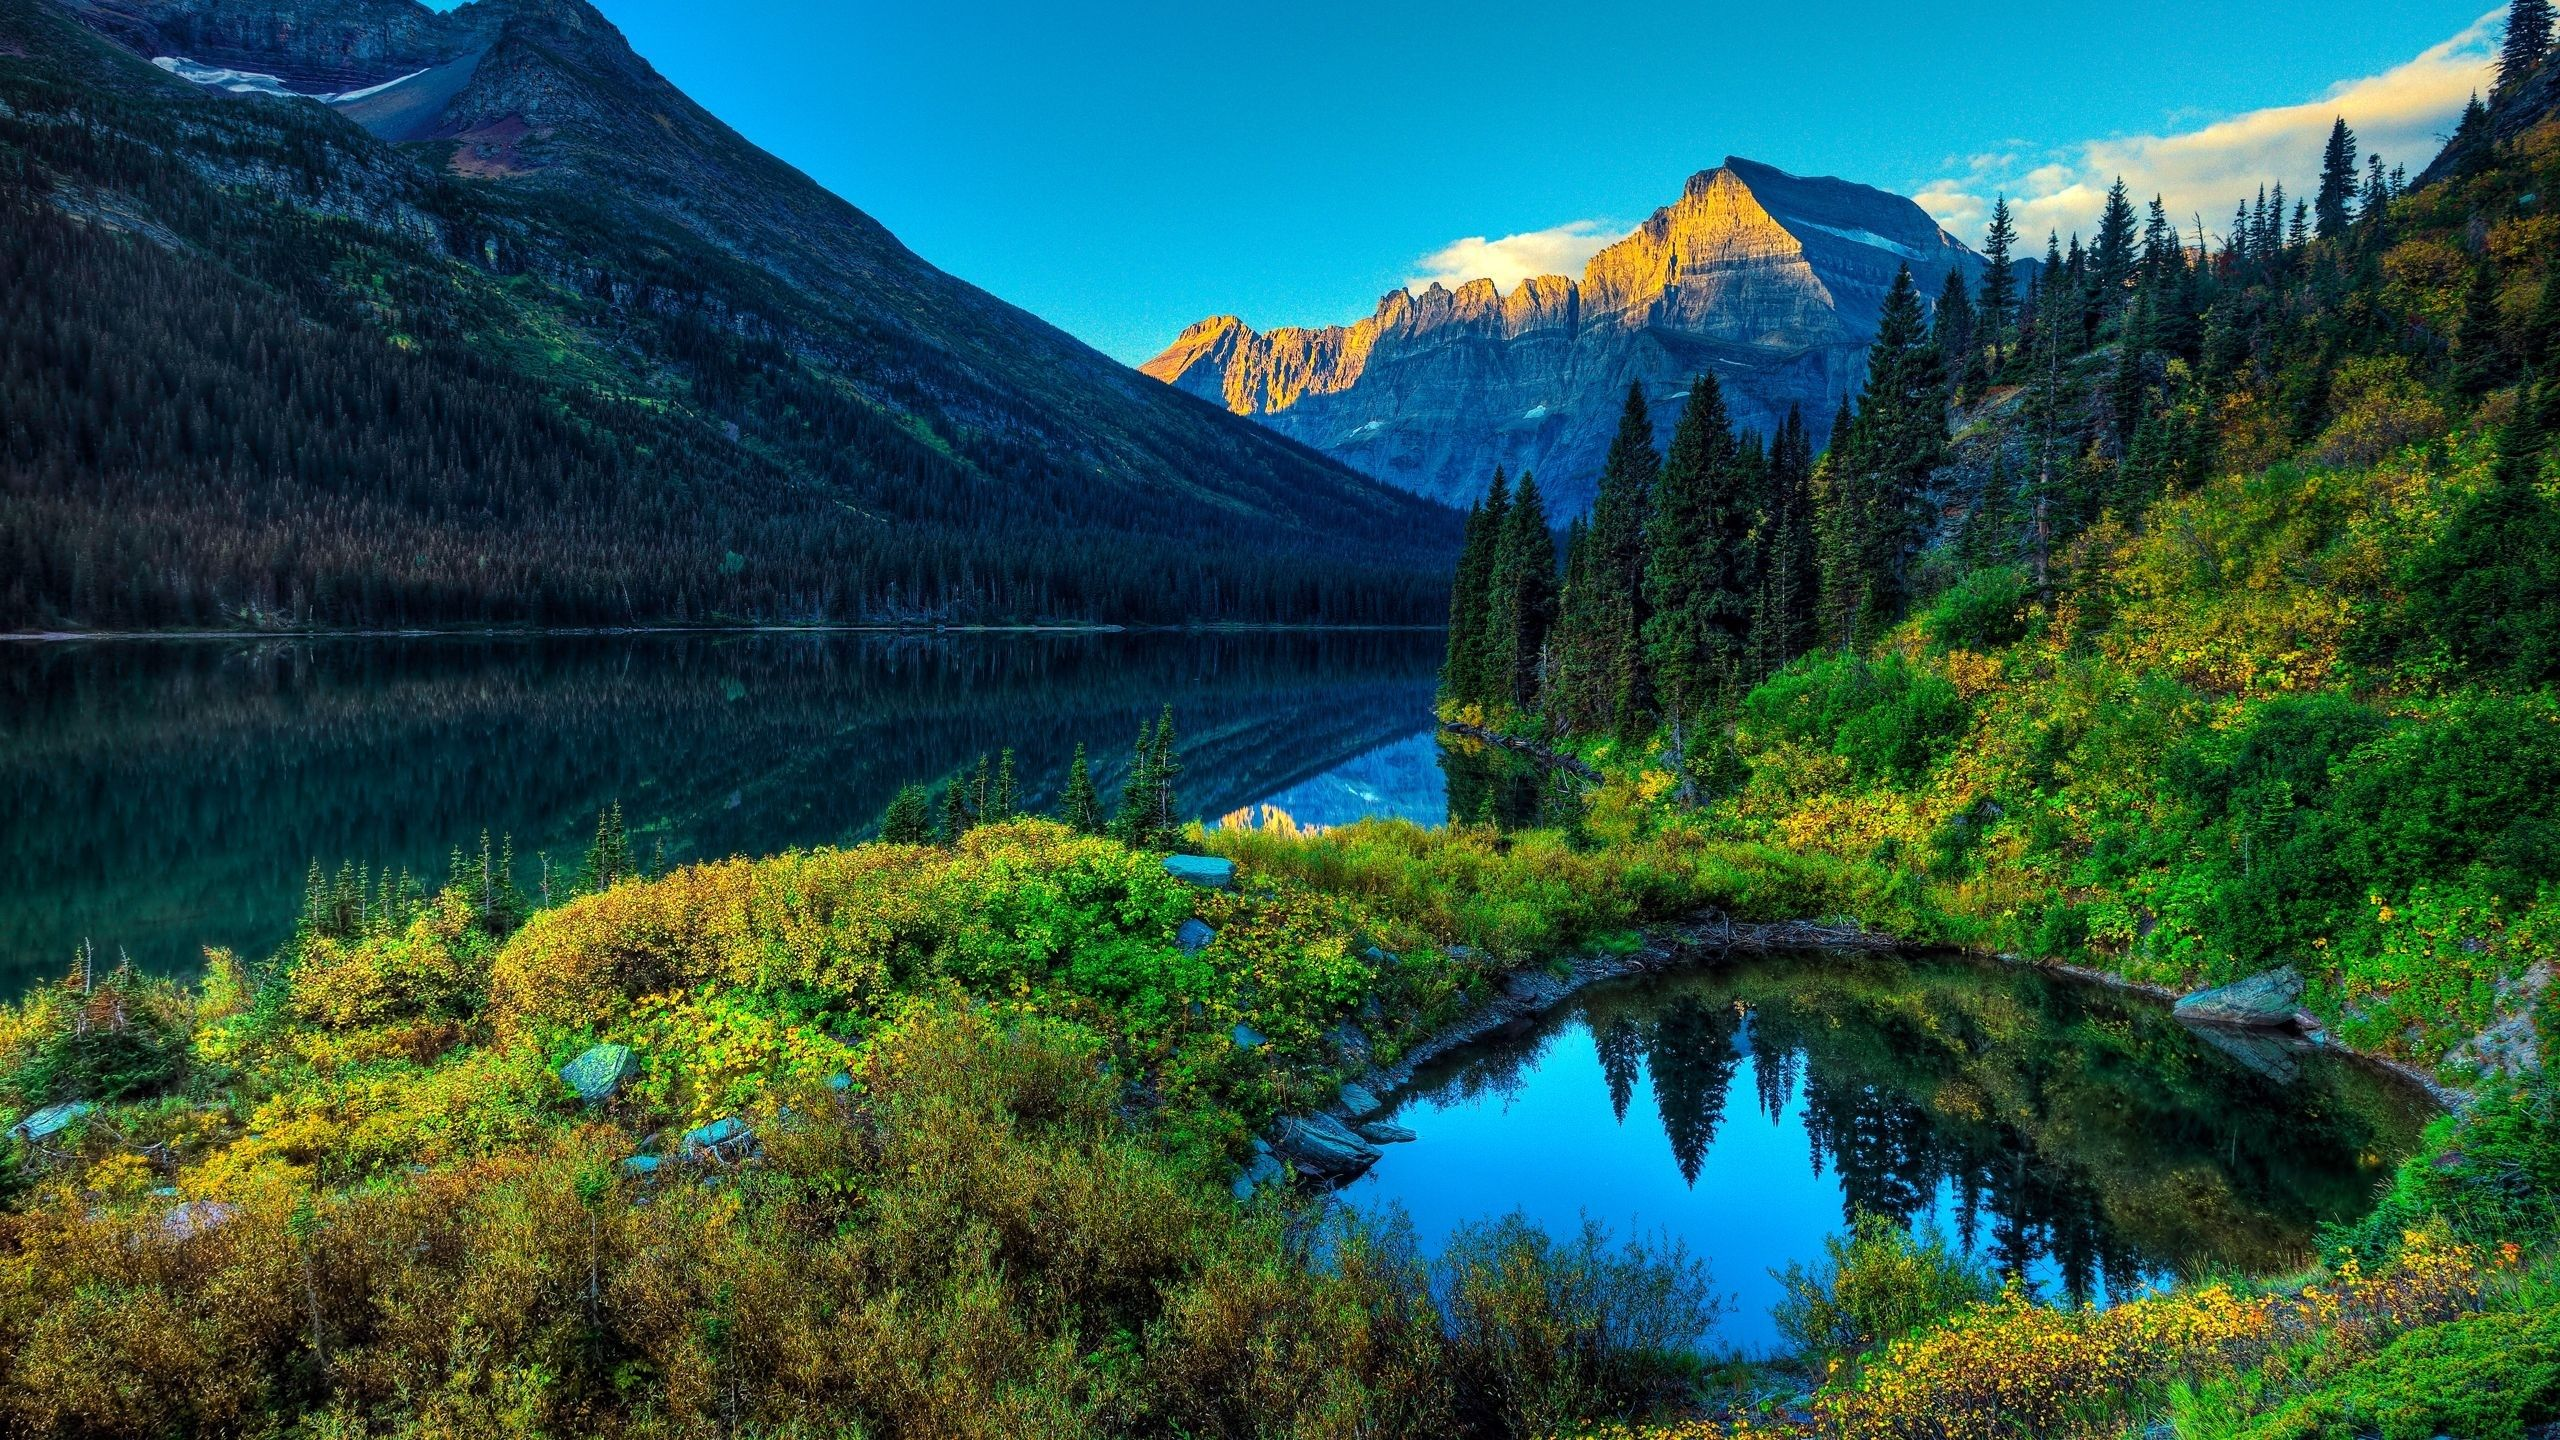 Great Wallpaper Mountain 1440p - c6a940776292357cb7735b888242795f  Snapshot_4590100.jpg